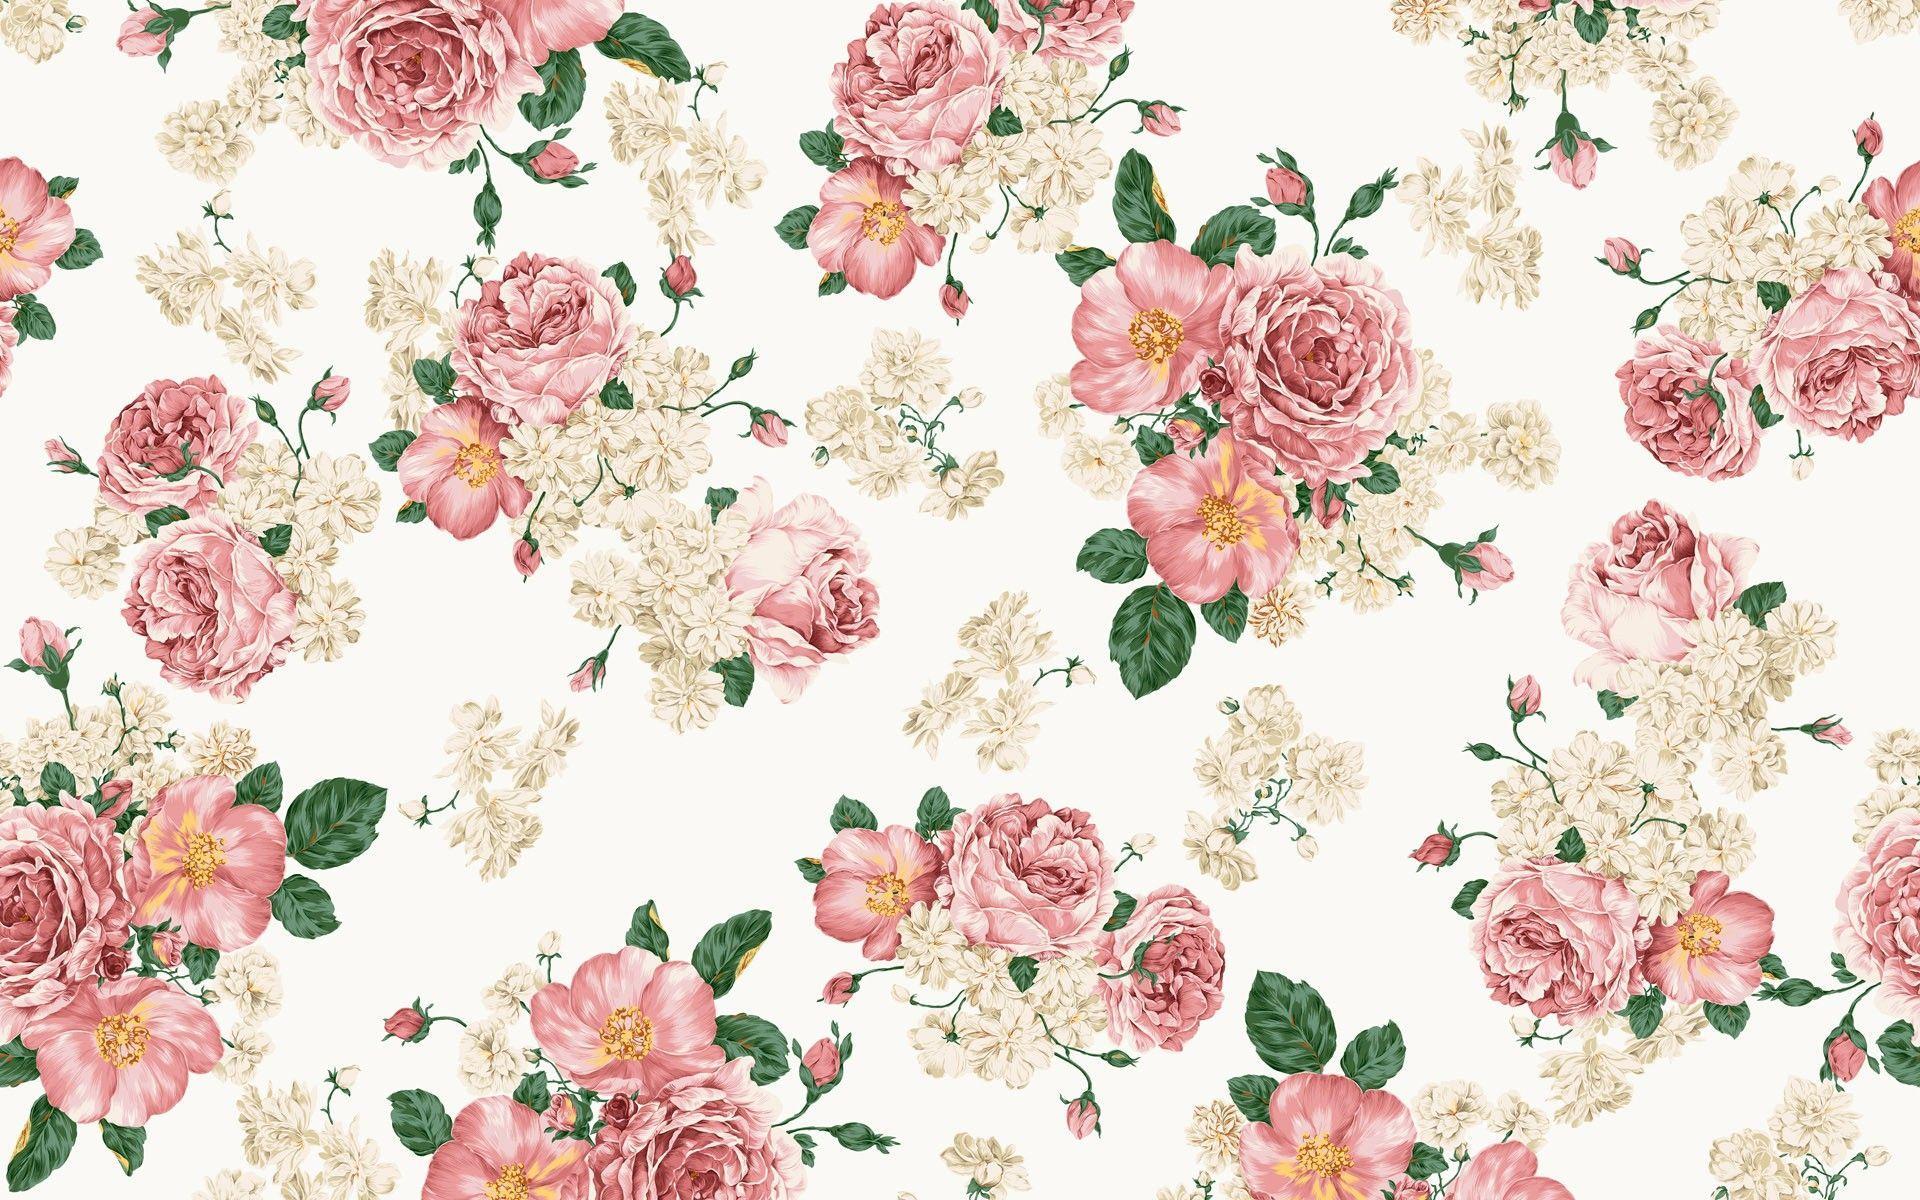 Vintage Floral Ipad Wallpaper